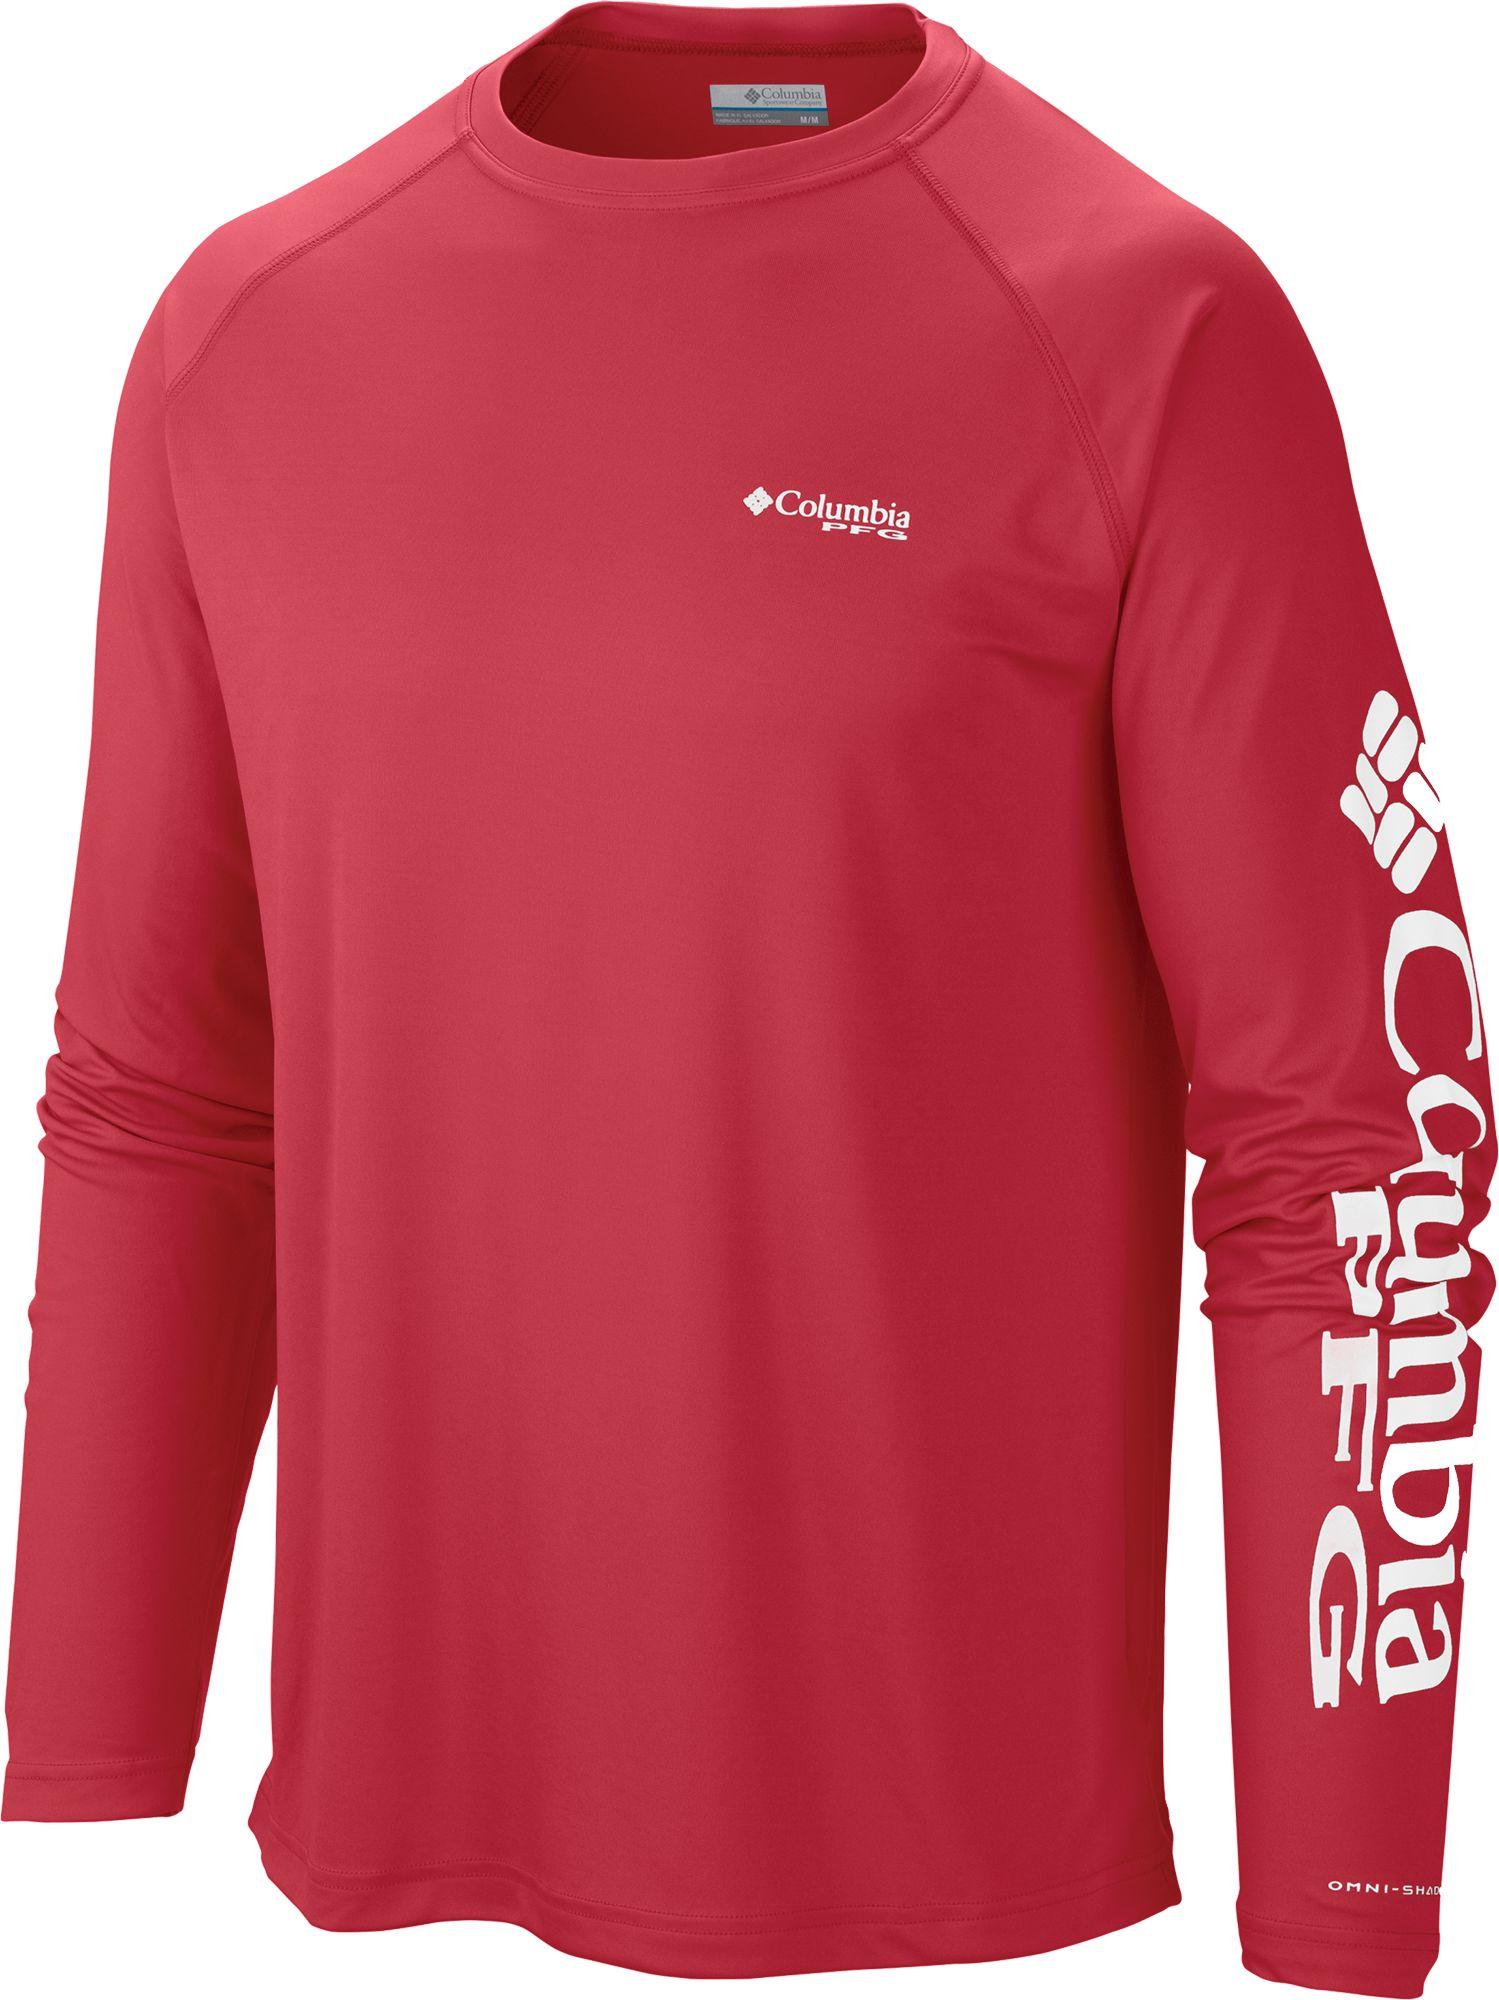 8a6eeada34e5 Columbia Men's PFG Terminal Tackle Long Sleeve Shirt | Products ...